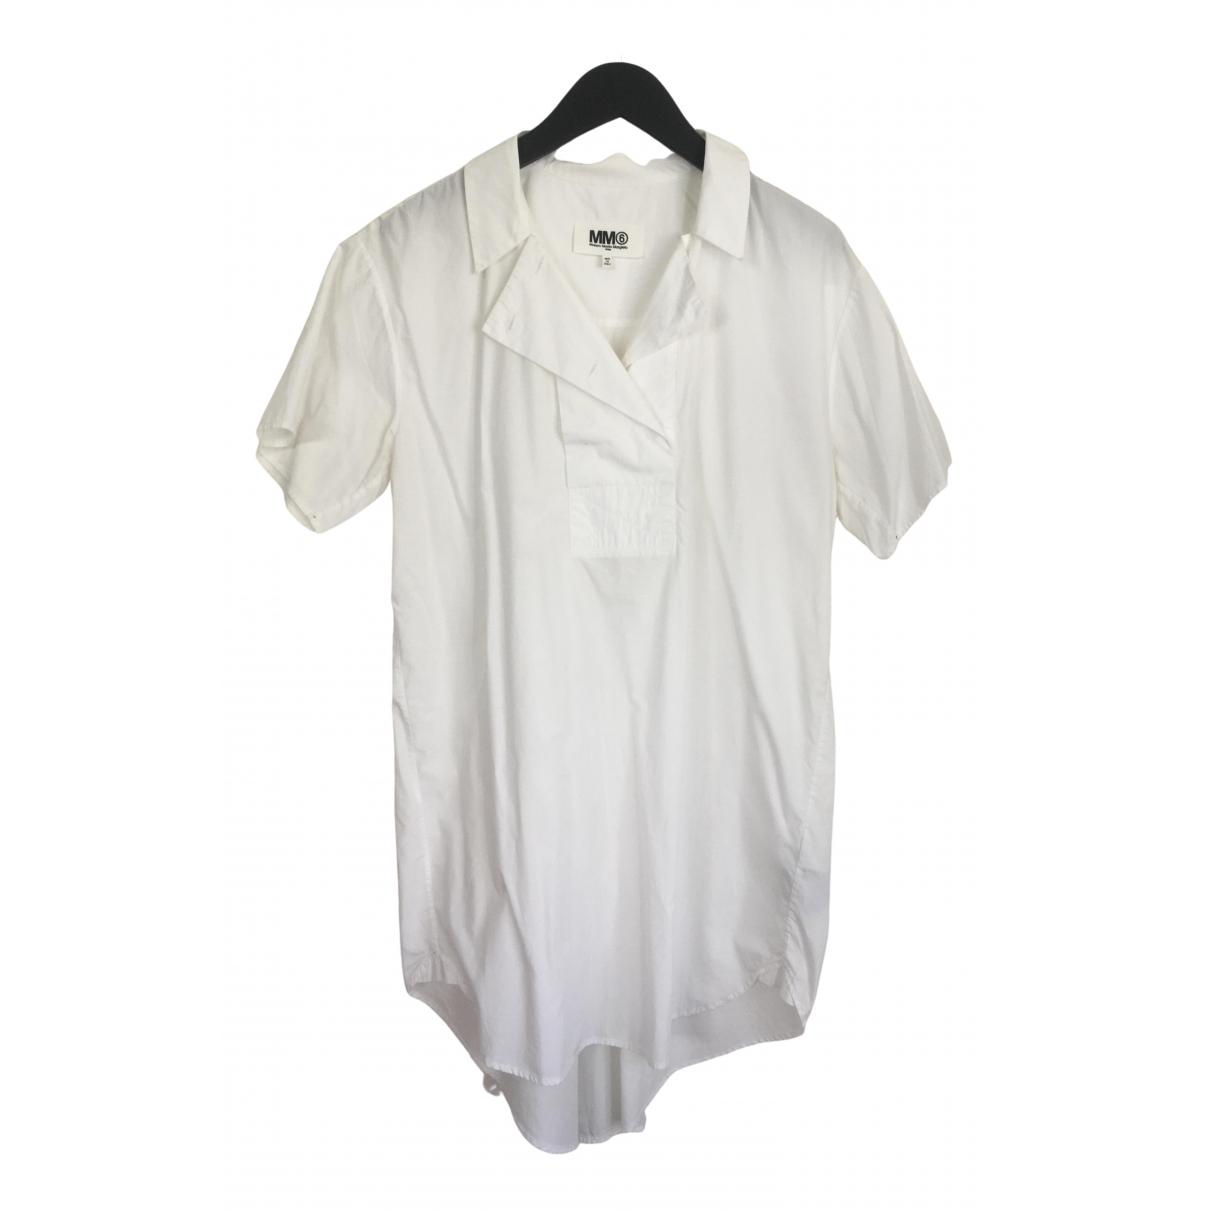 Mm6 N White Cotton Shirts for Men 42 EU (tour de cou / collar)